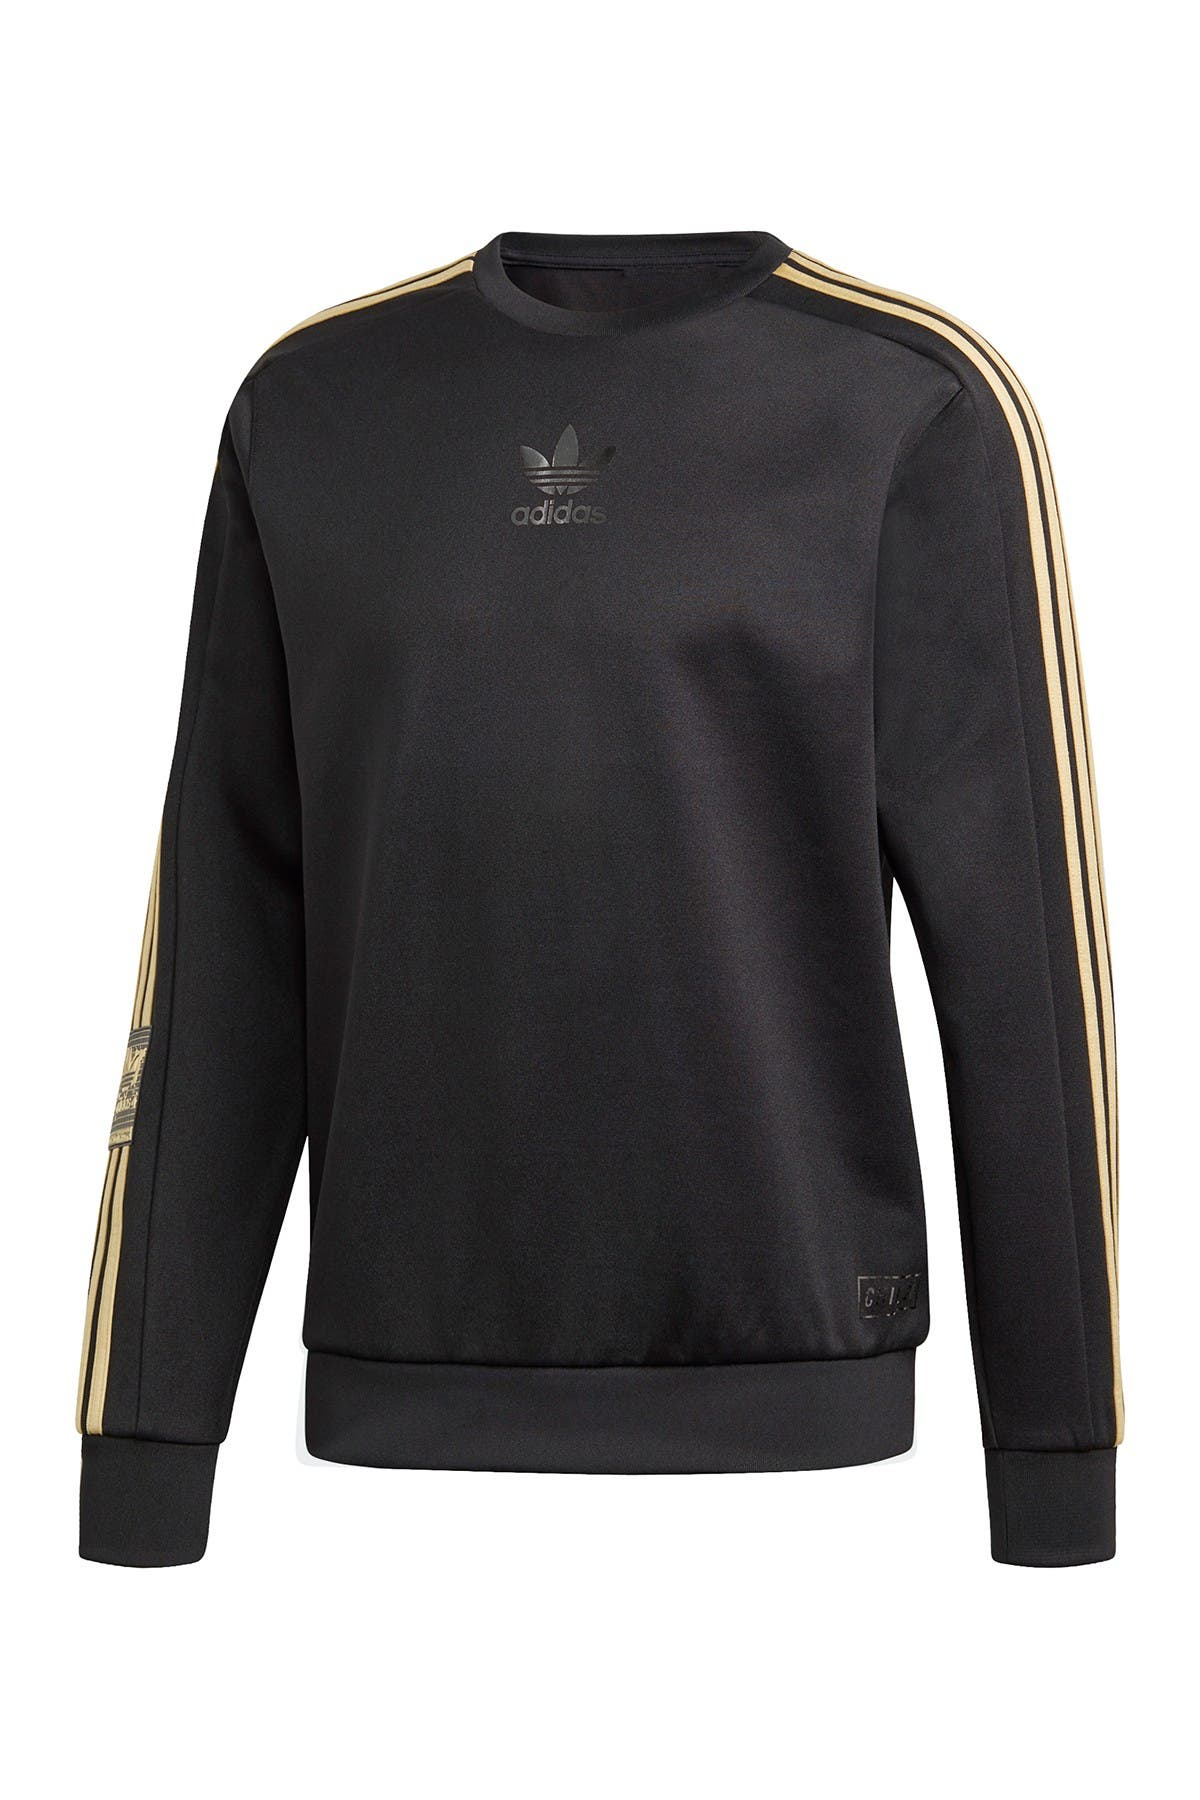 Image of adidas Chile 20 Crew Sweatshirt